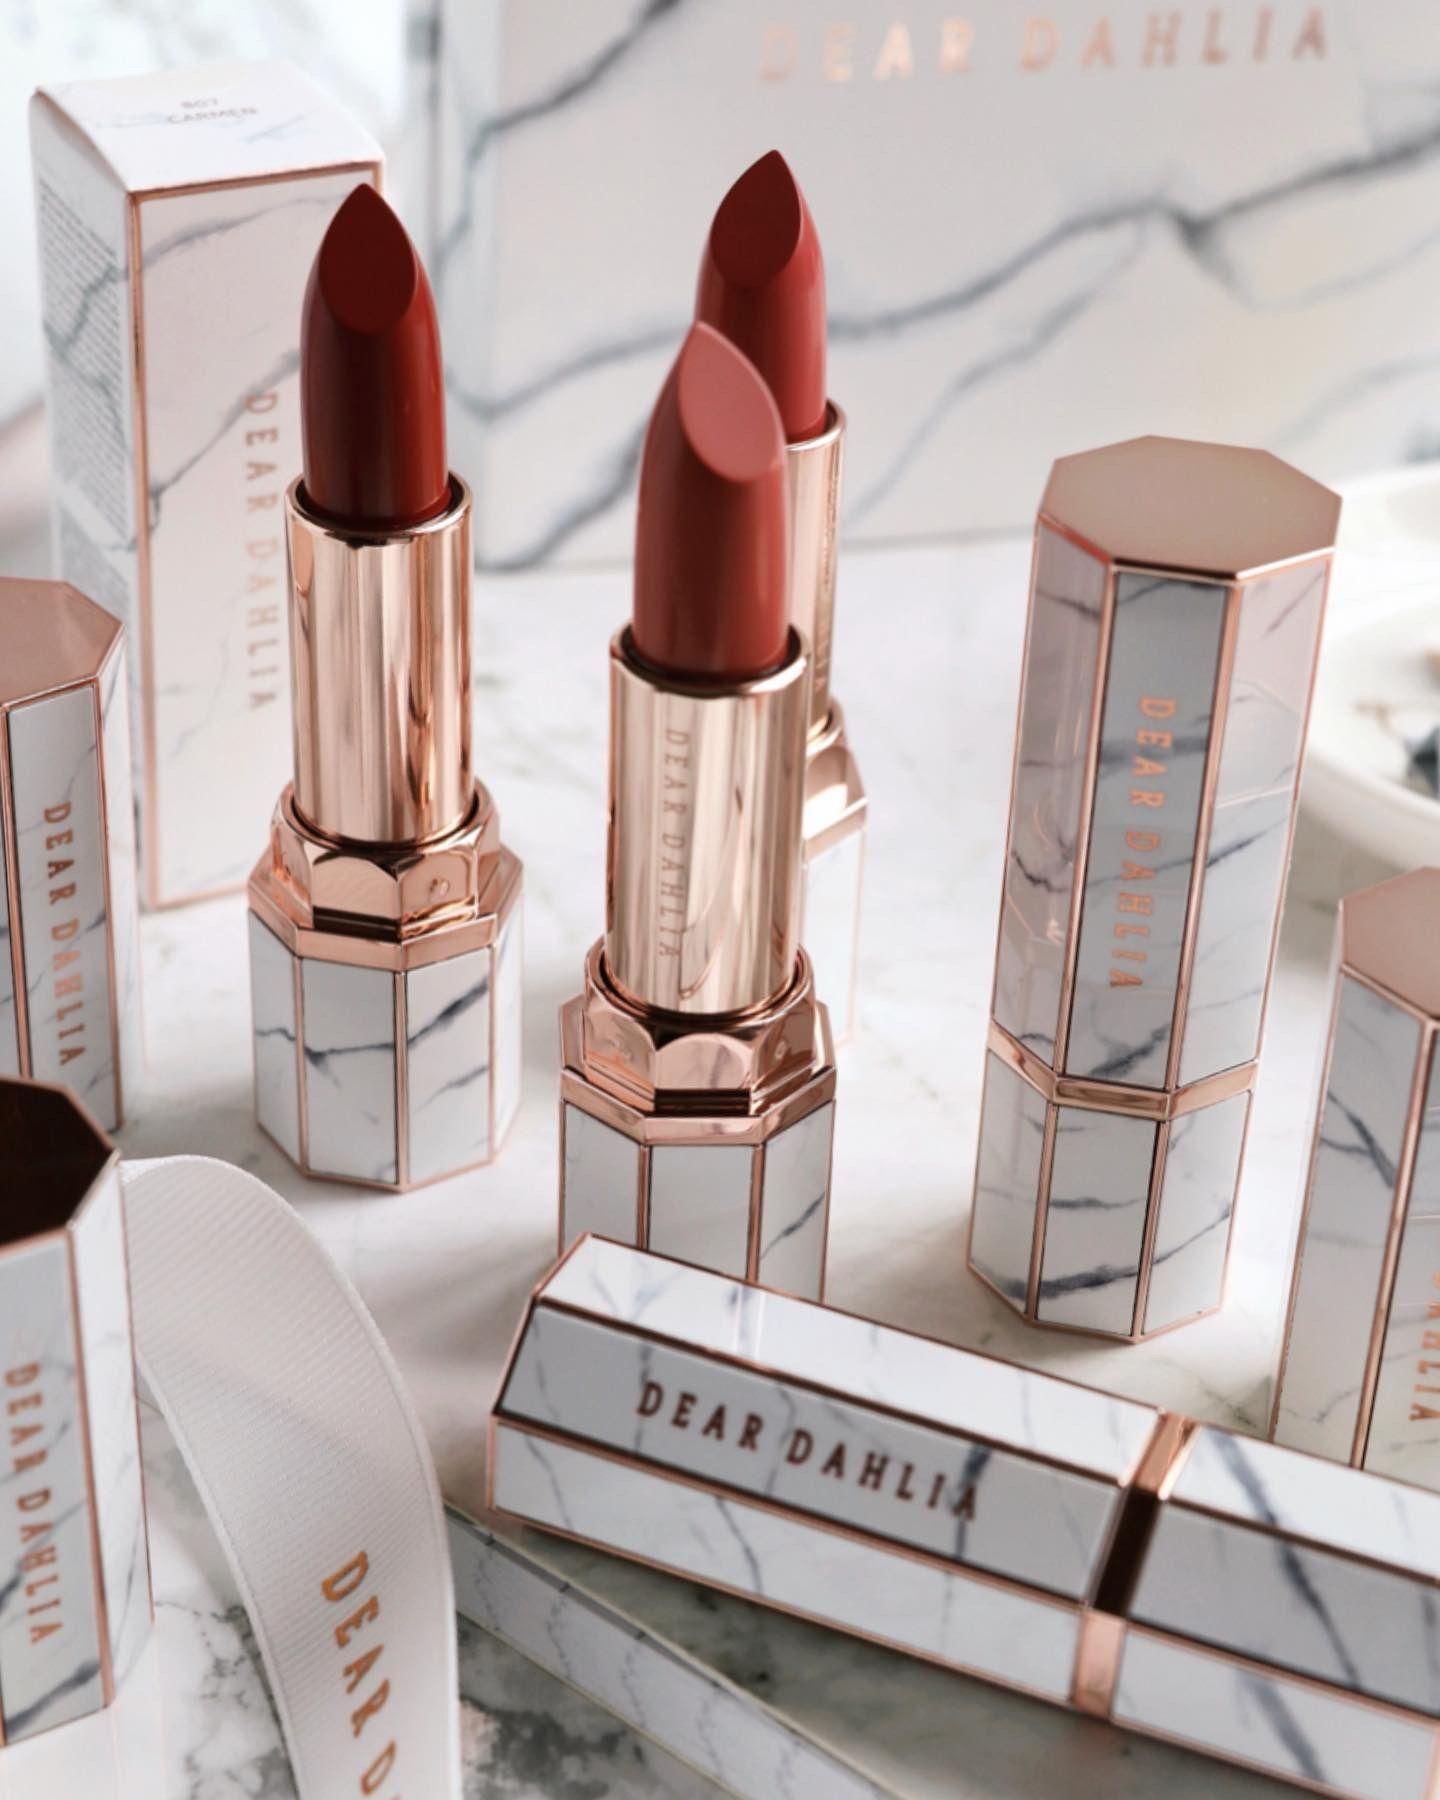 Dear Dahlia Lipsticks Luxury makeup, Lipstick